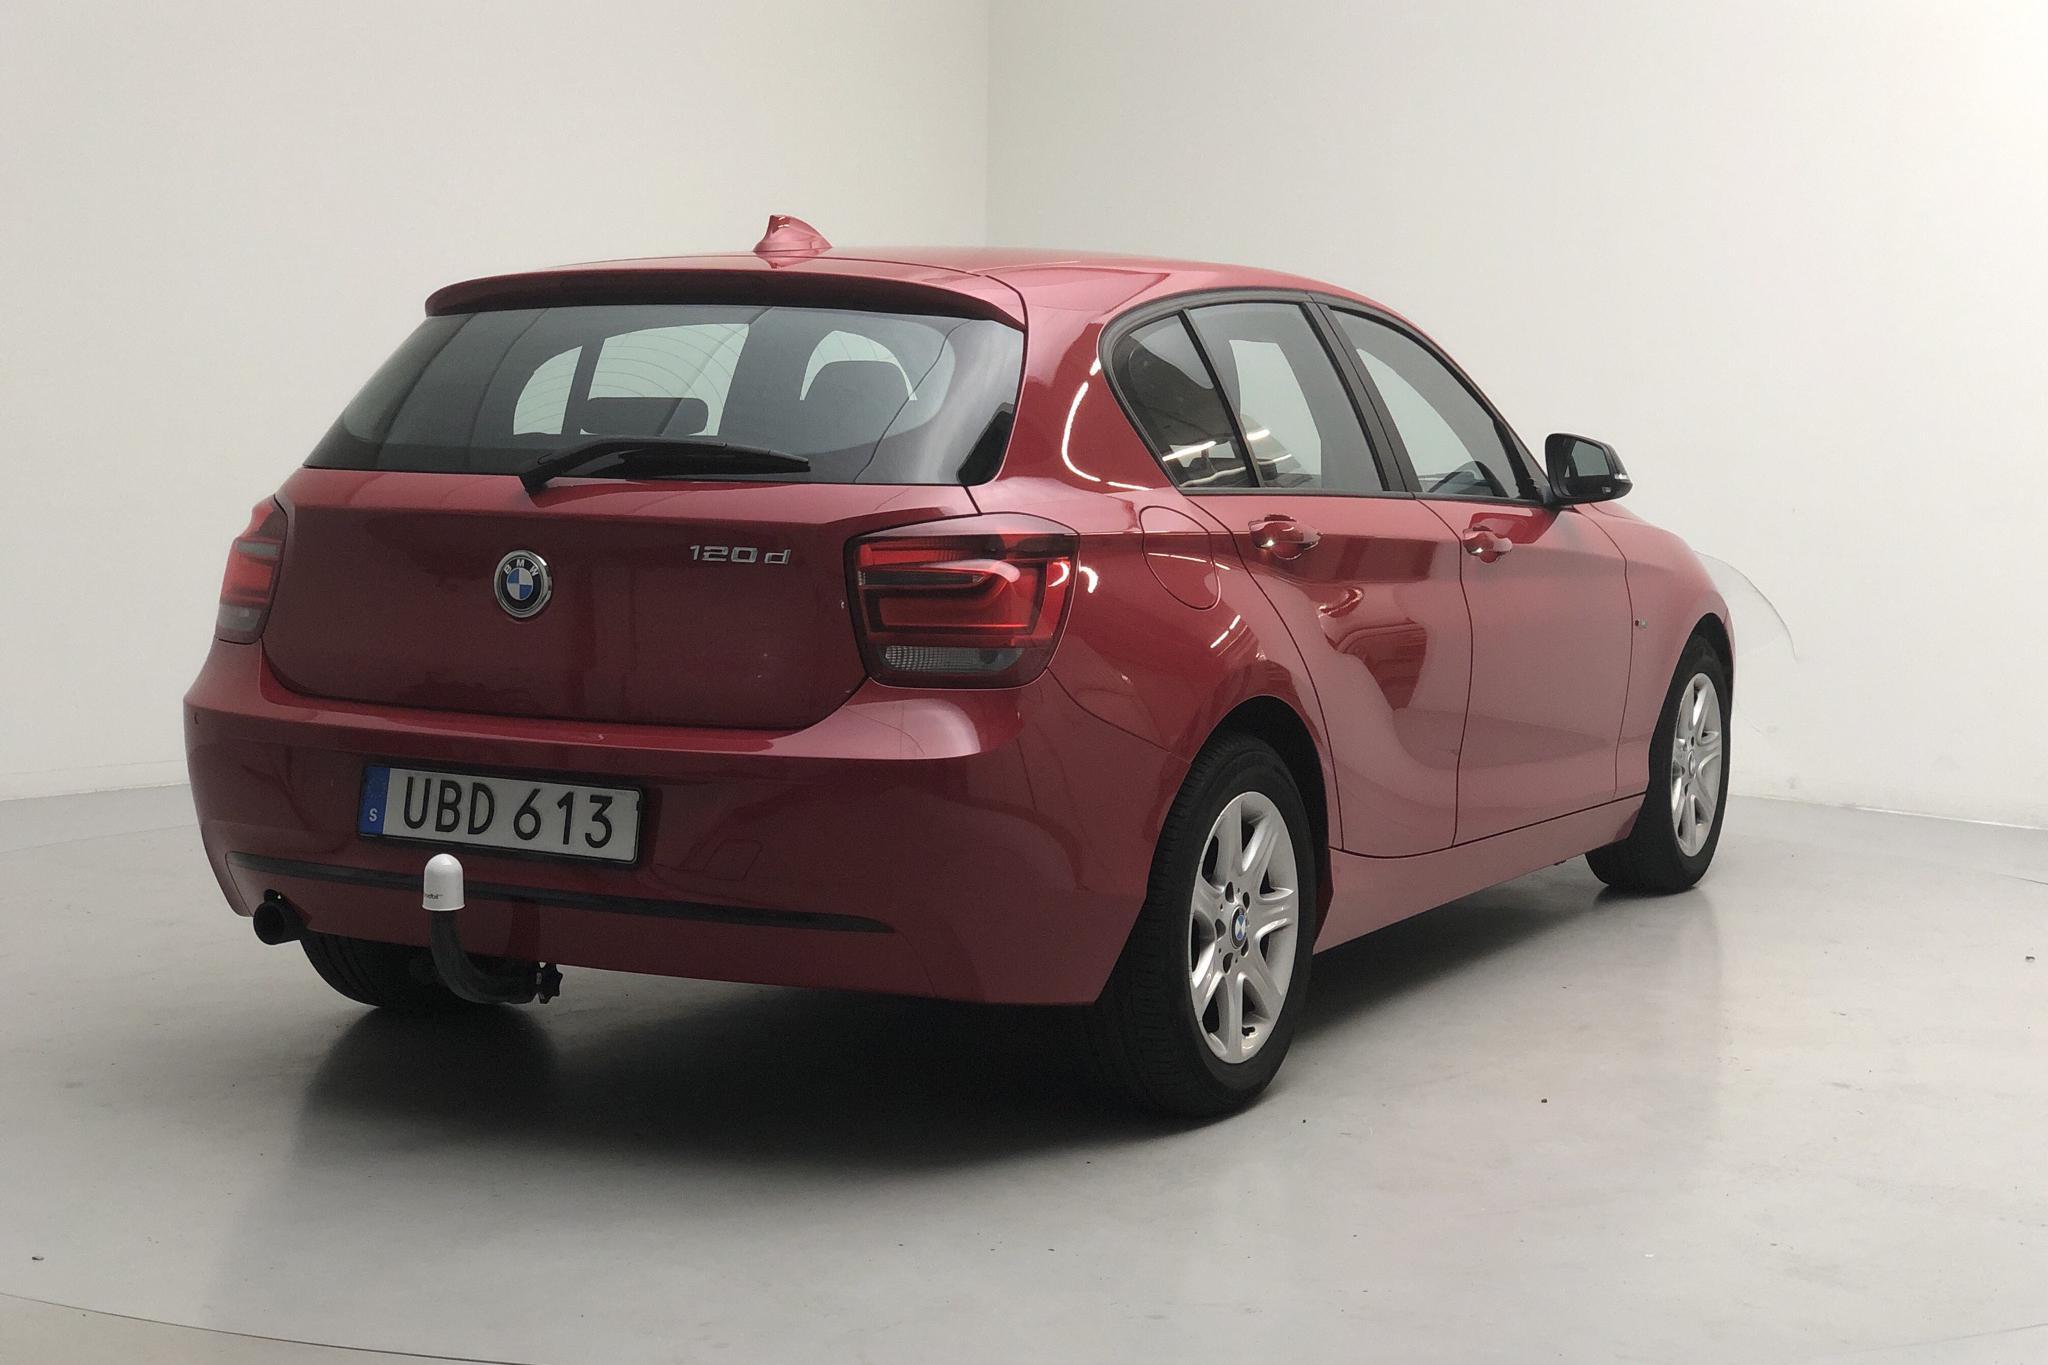 BMW 120d 5dr, F20 (184hk) - 166 000 km - Manual - red - 2013